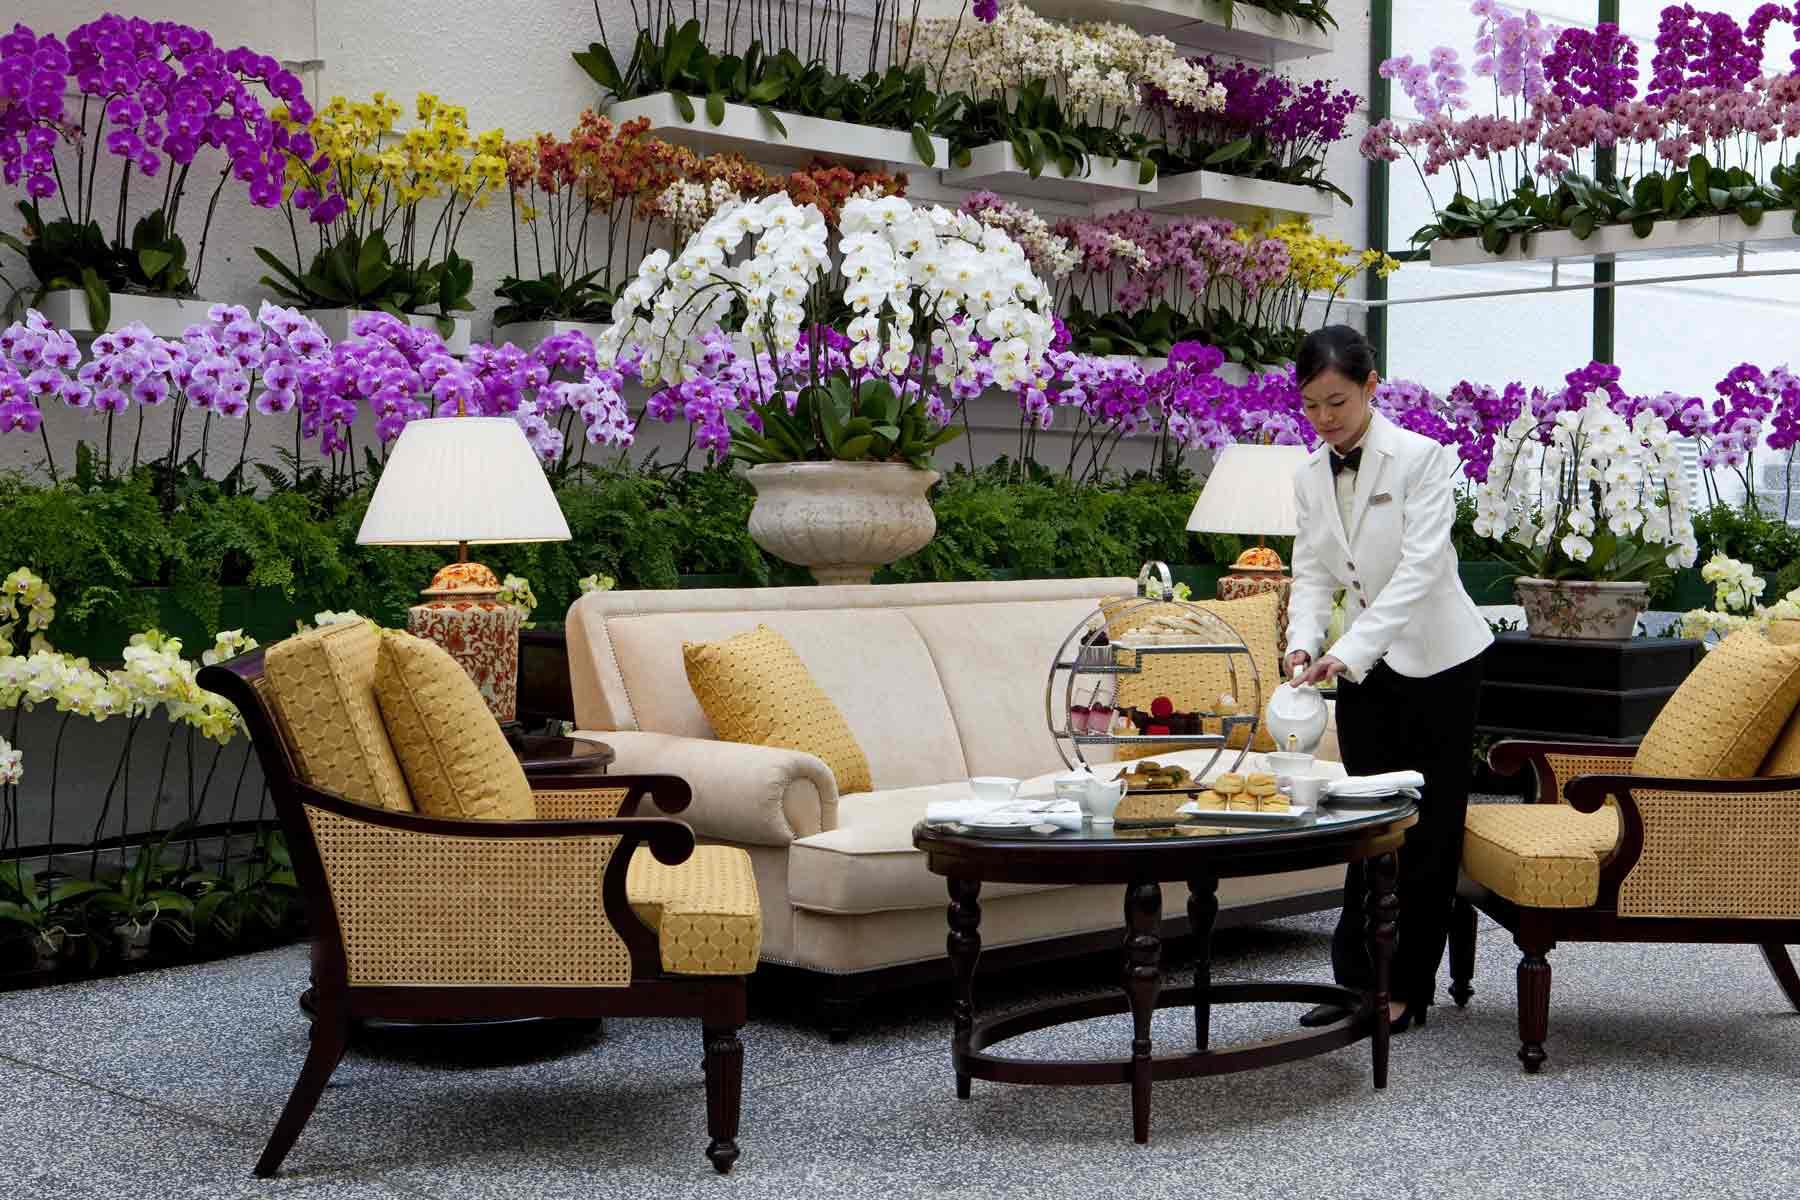 The-Majestic-Hotel-Kuala-Lumpur---The-Orchid-Conservatory